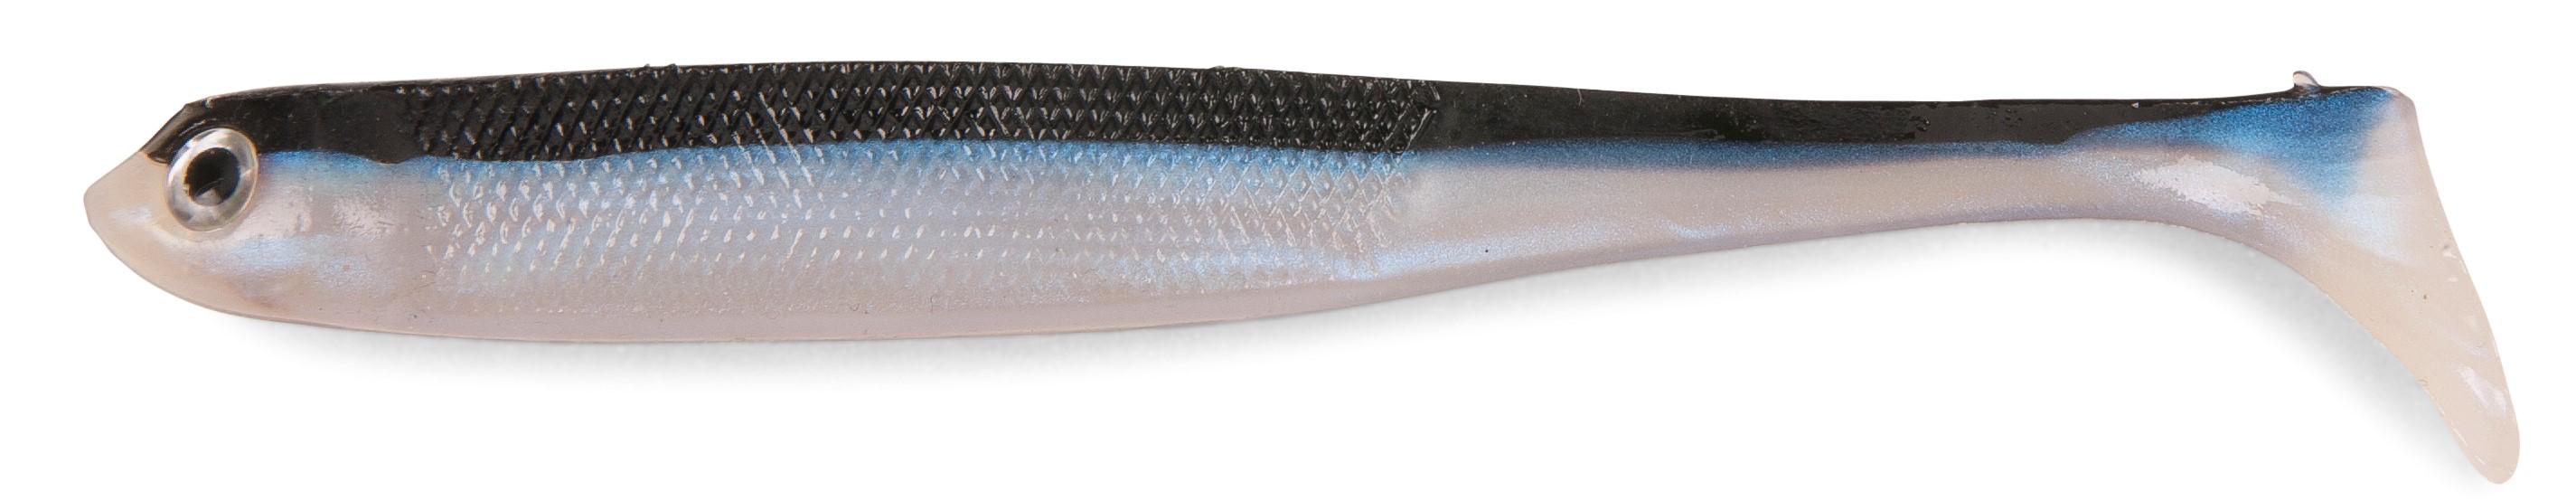 Iron Claw gumová nástraha Slim Jim 13 cm Vzor HR, 3 ks